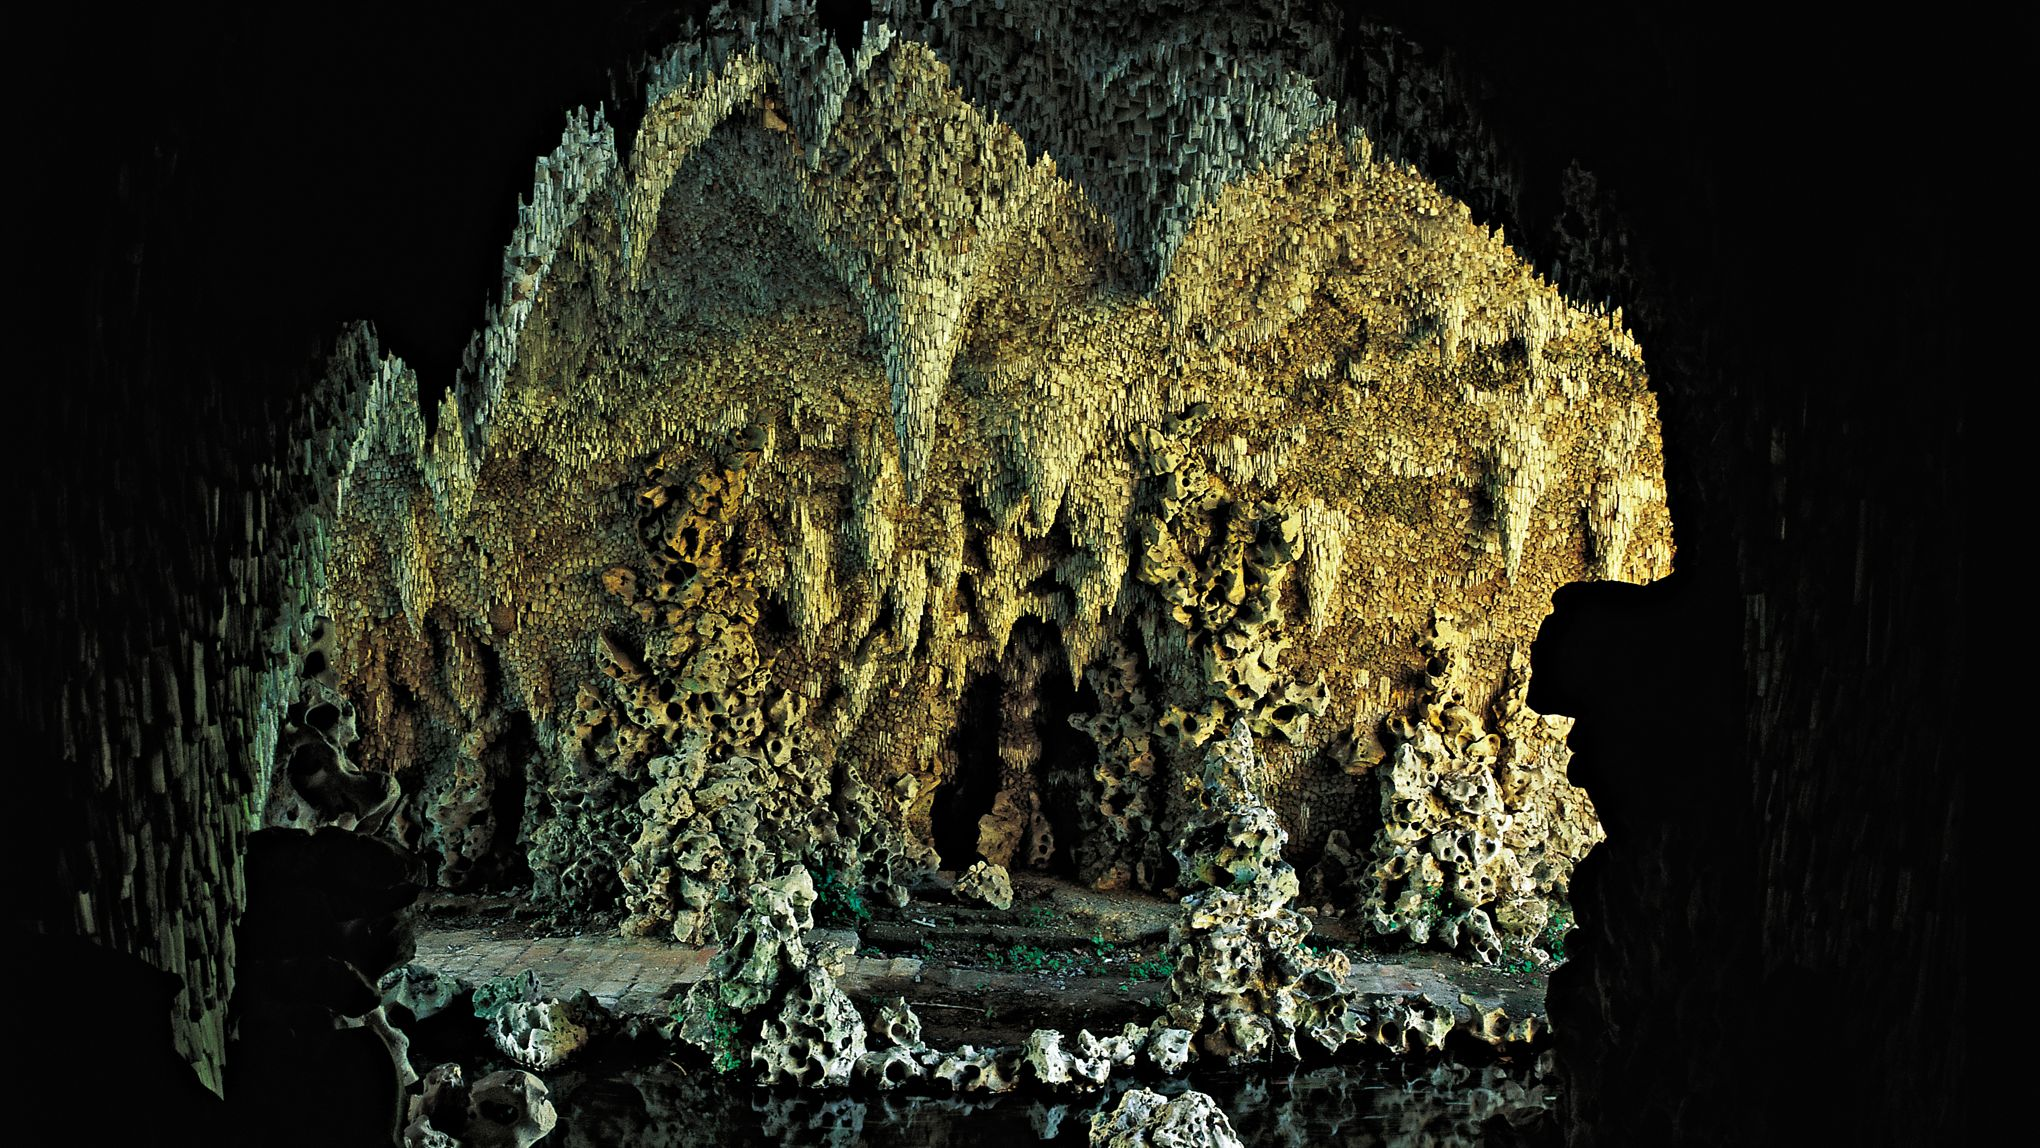 Voyage dans l 39 univers fantastique des grottes de jardin for Jardin fantastique